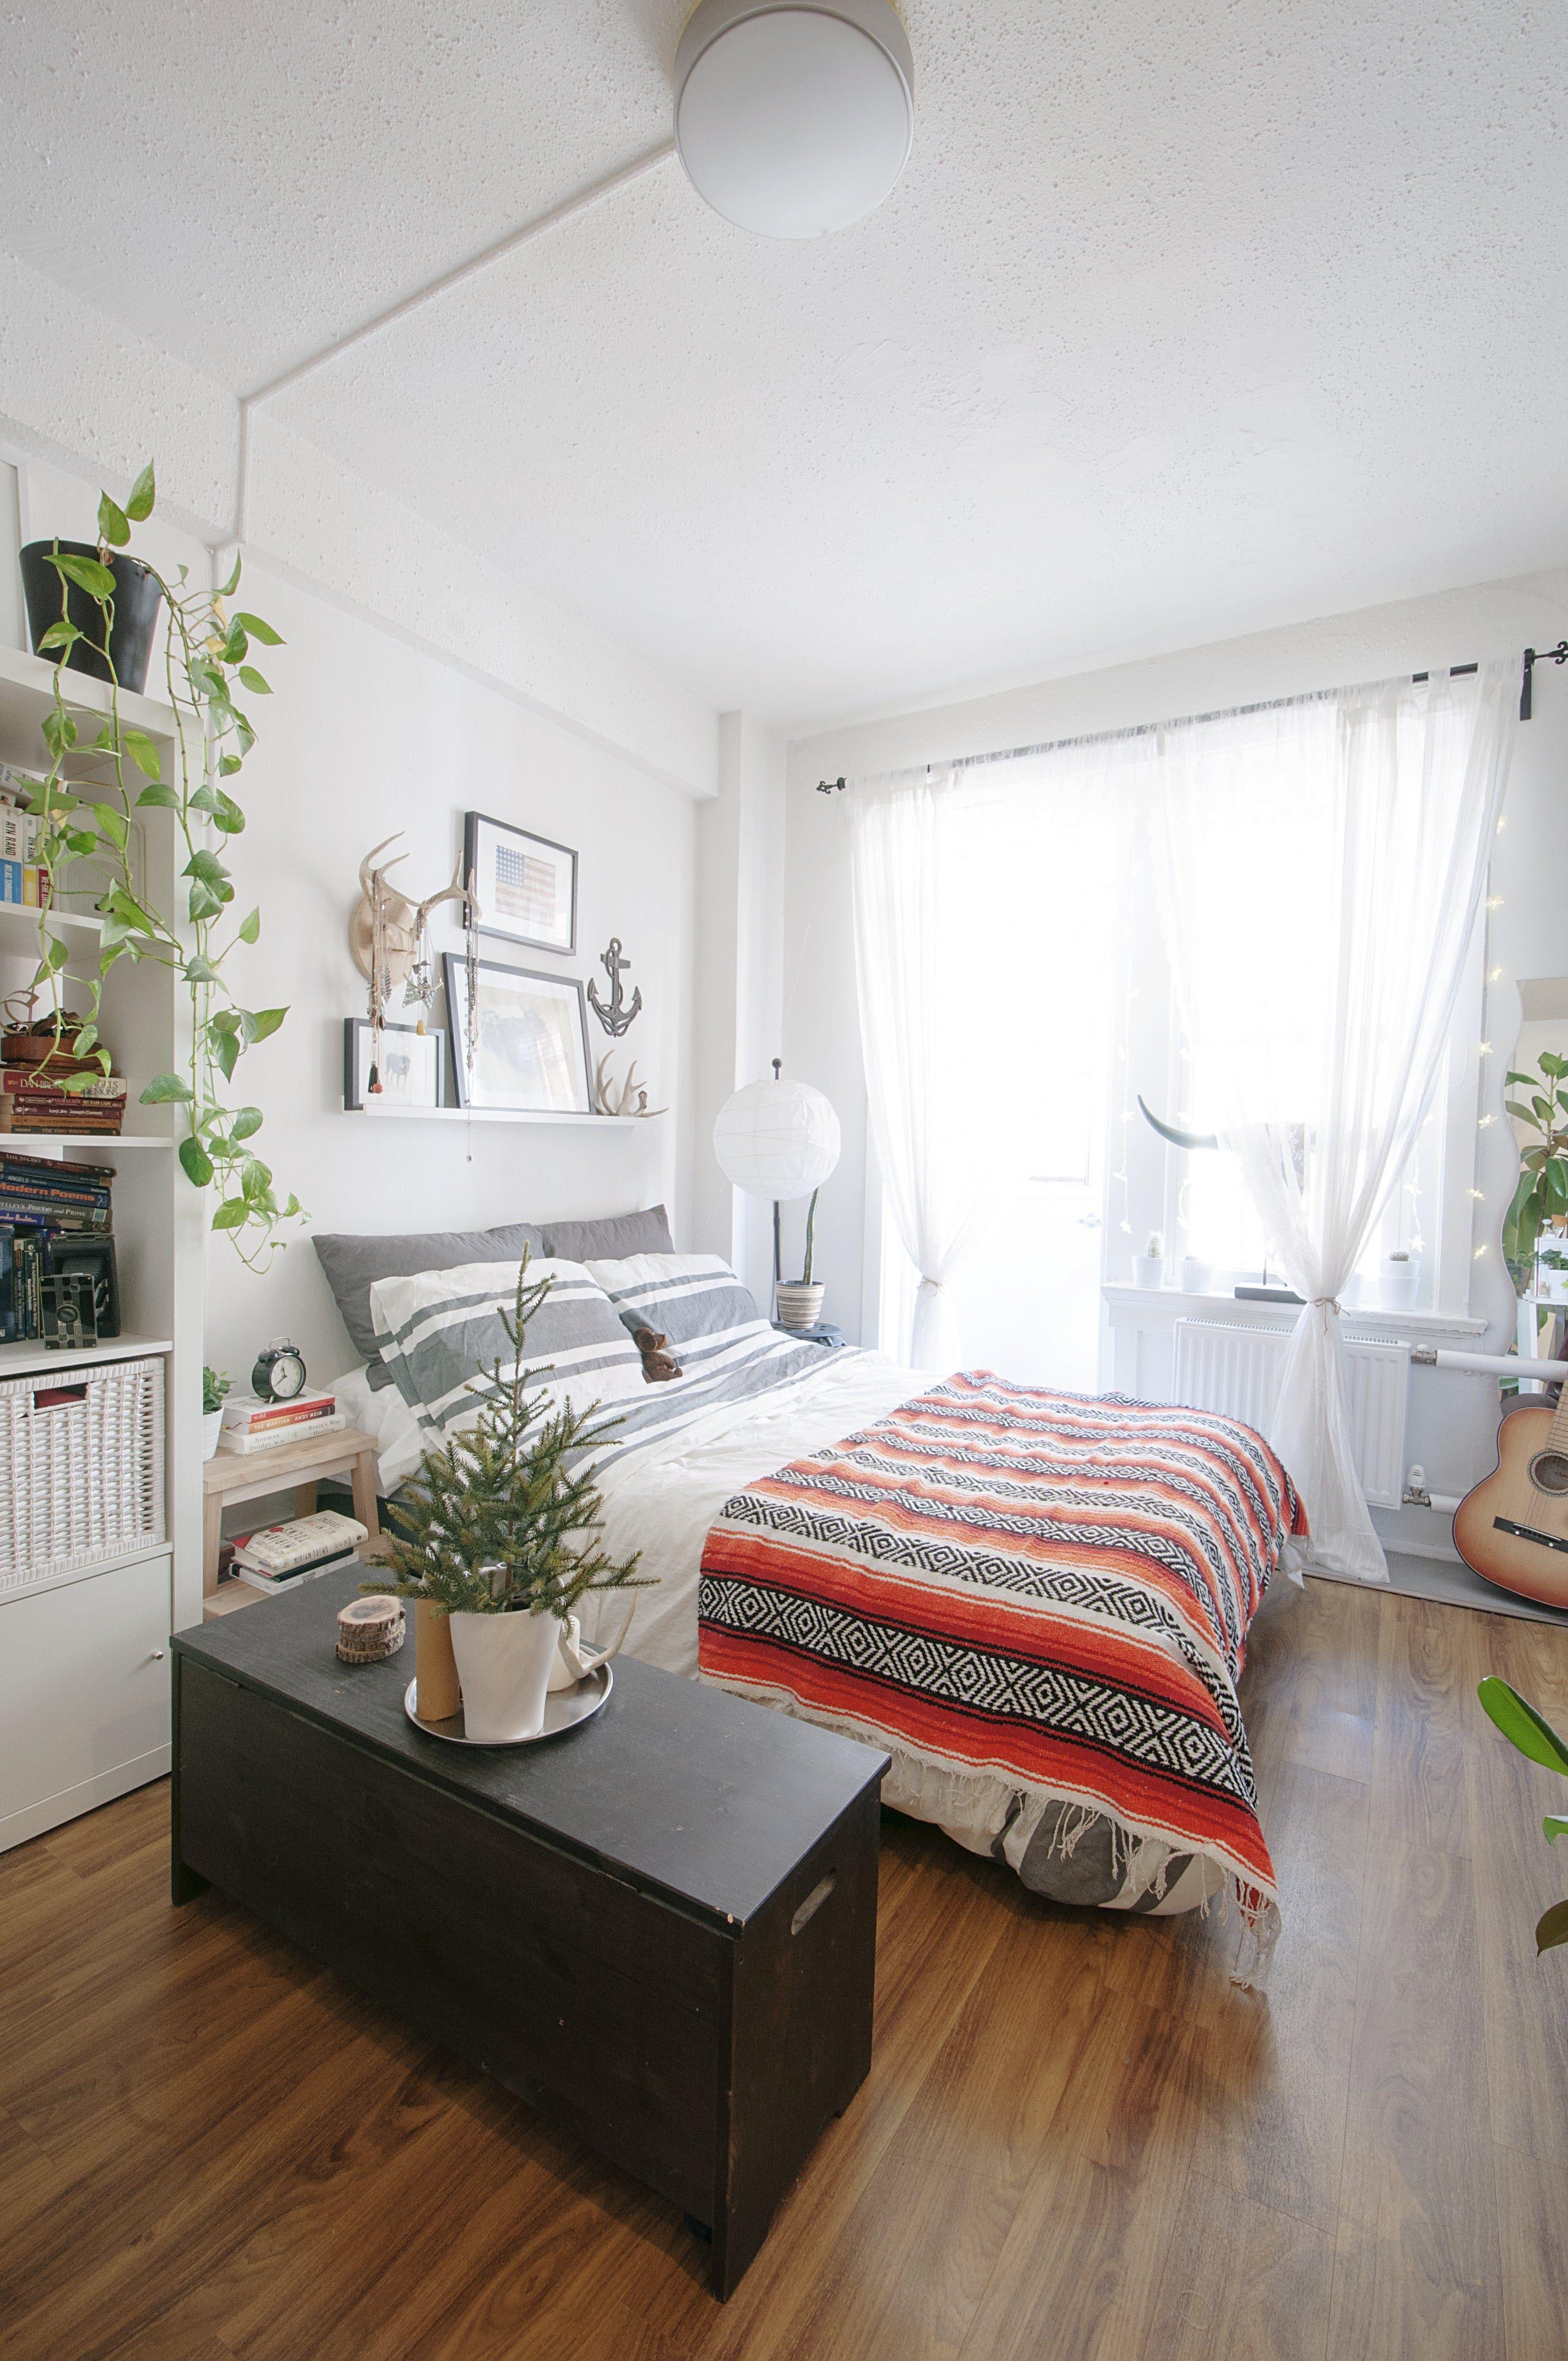 5 Studio Apartment Layouts that Work | Bauli e Valigie